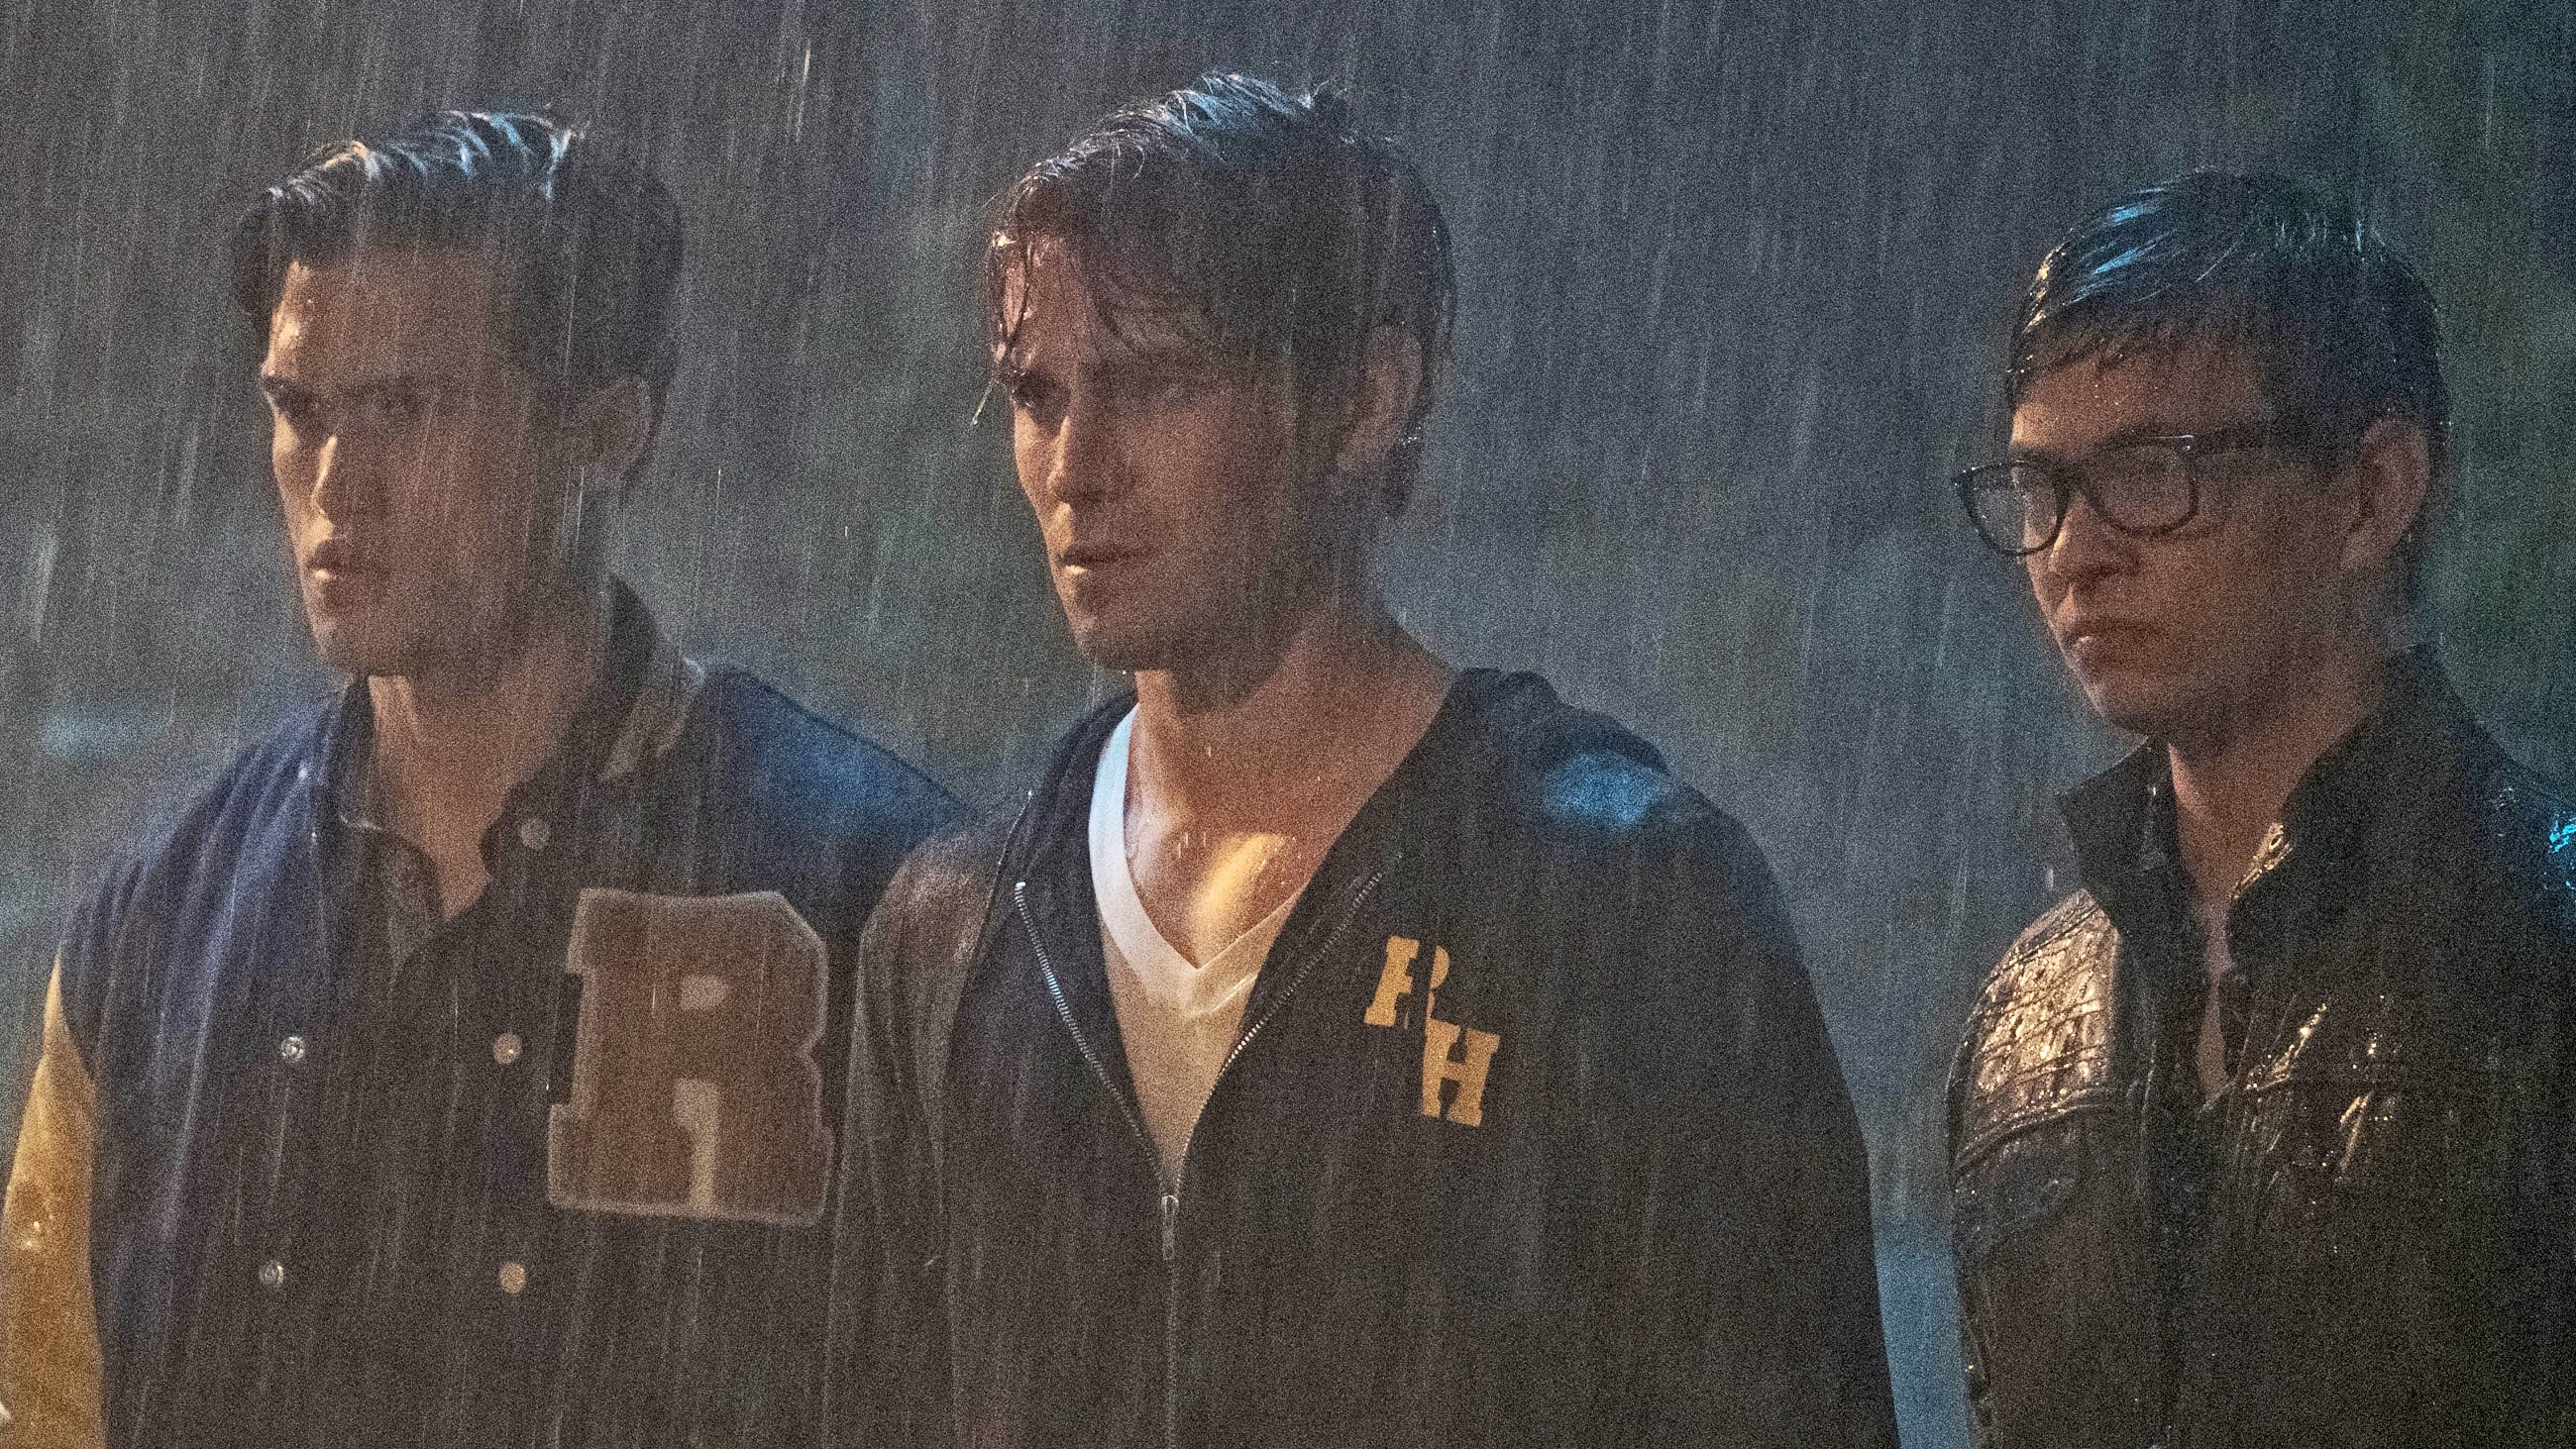 Riverdale - Season 2 Episode 4 : Chapter Seventeen: The Town That Dreaded Sundown